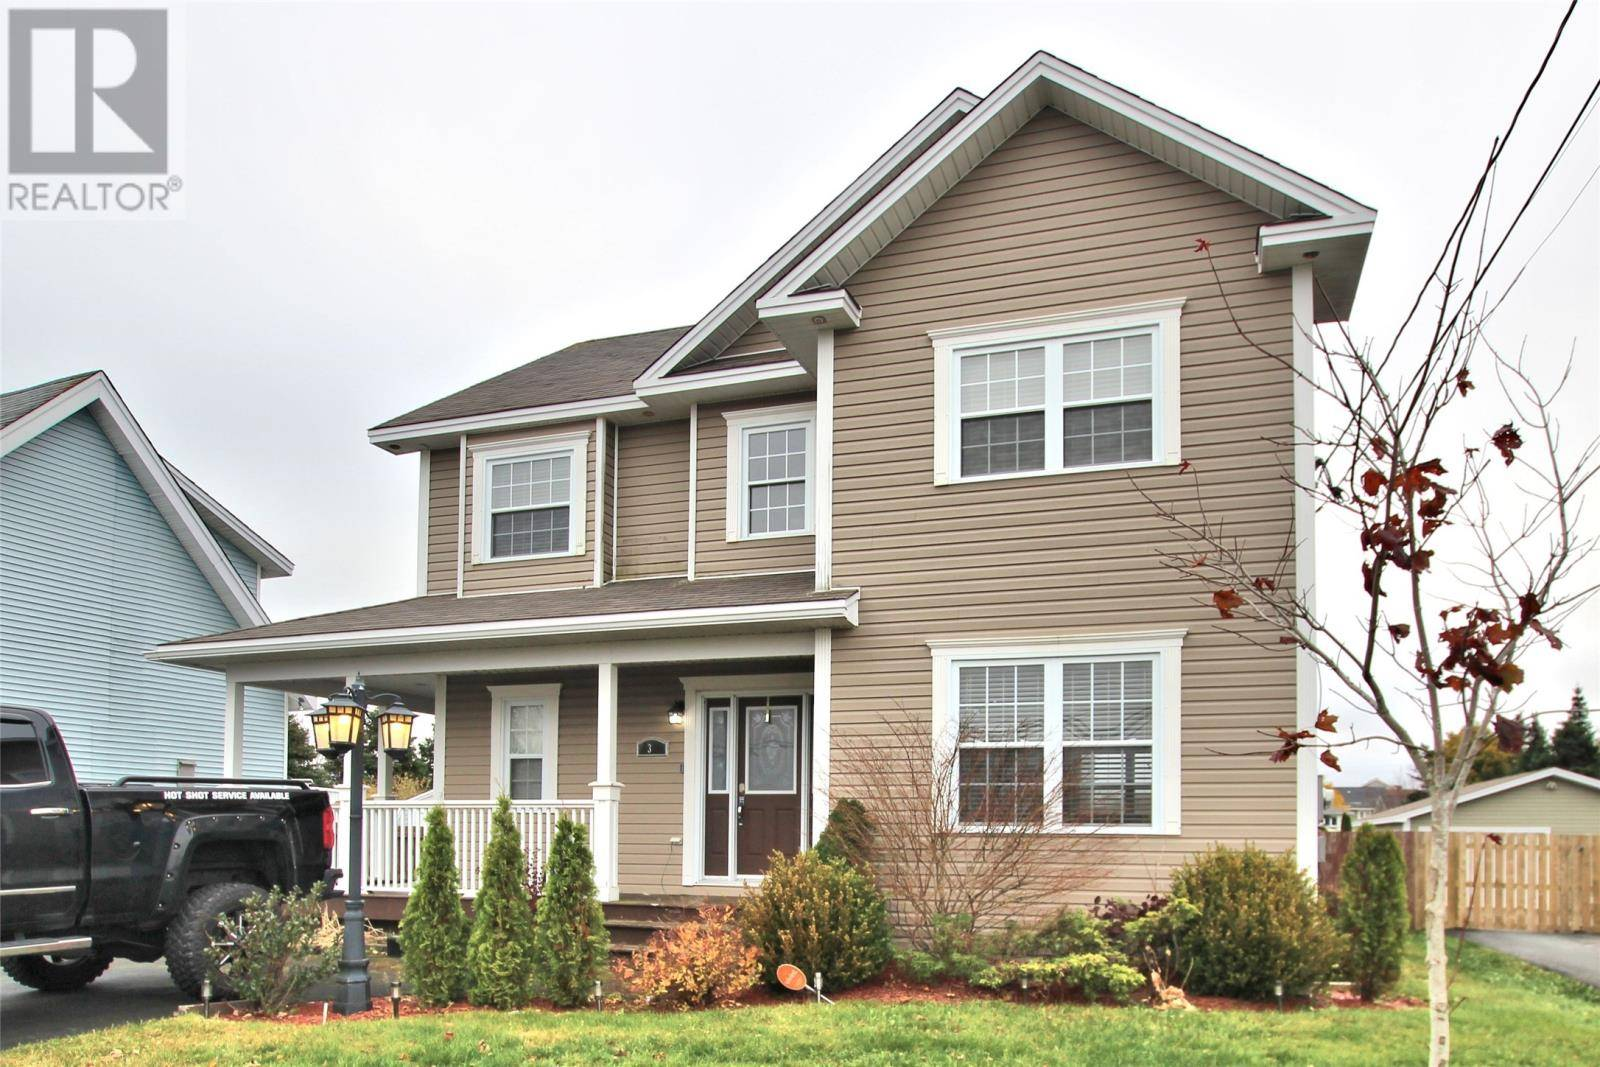 House for sale at 39 Doyles Rd St. John's Newfoundland - MLS: 1206727